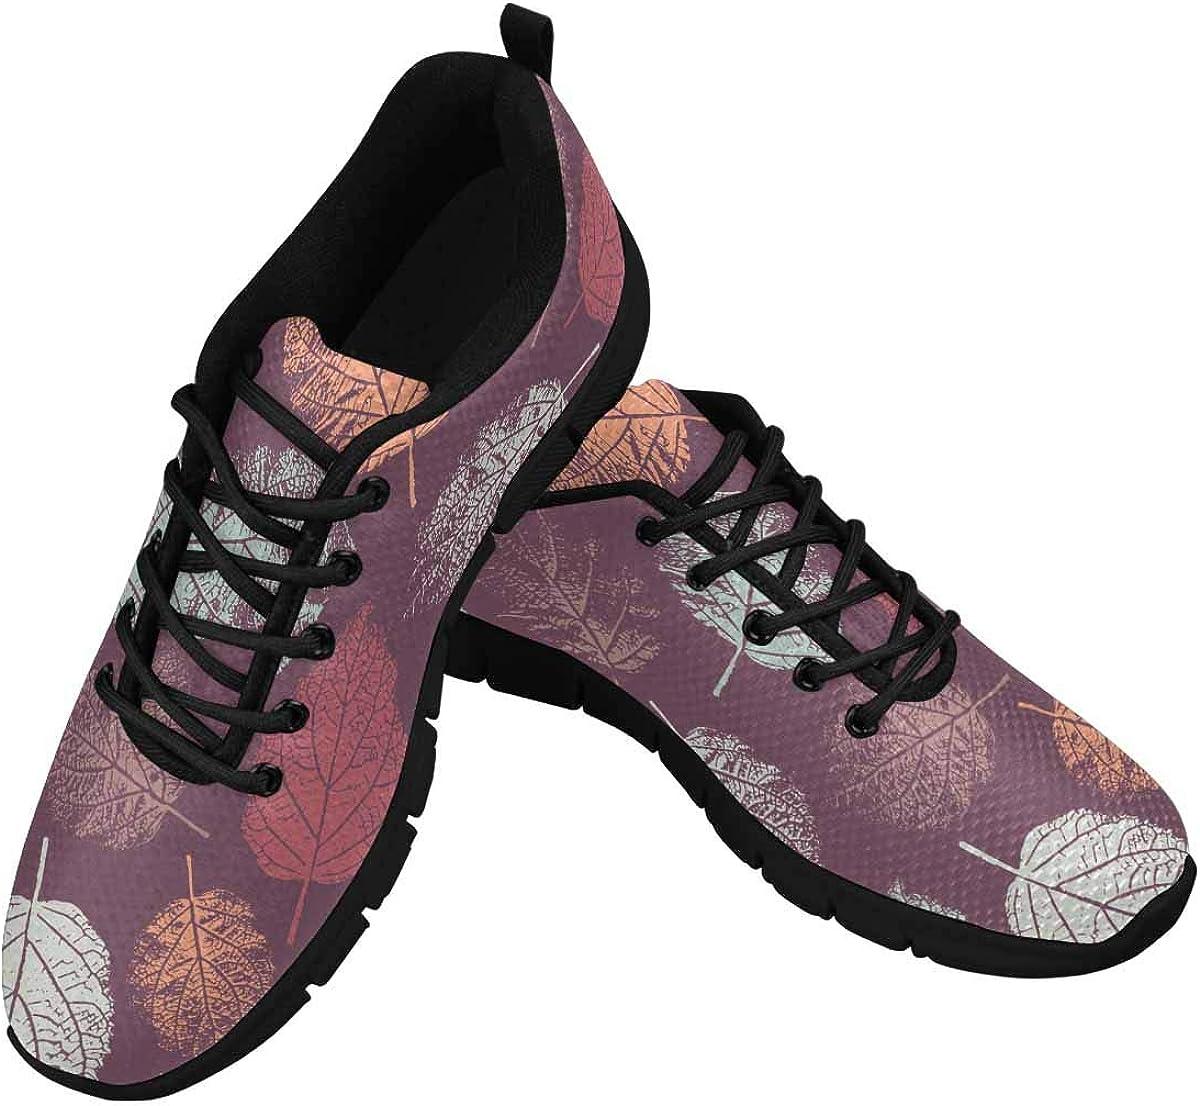 INTERESTPRINT Forest Leafs Women's Walking Shoes Lightweight Casual Running Sneakers